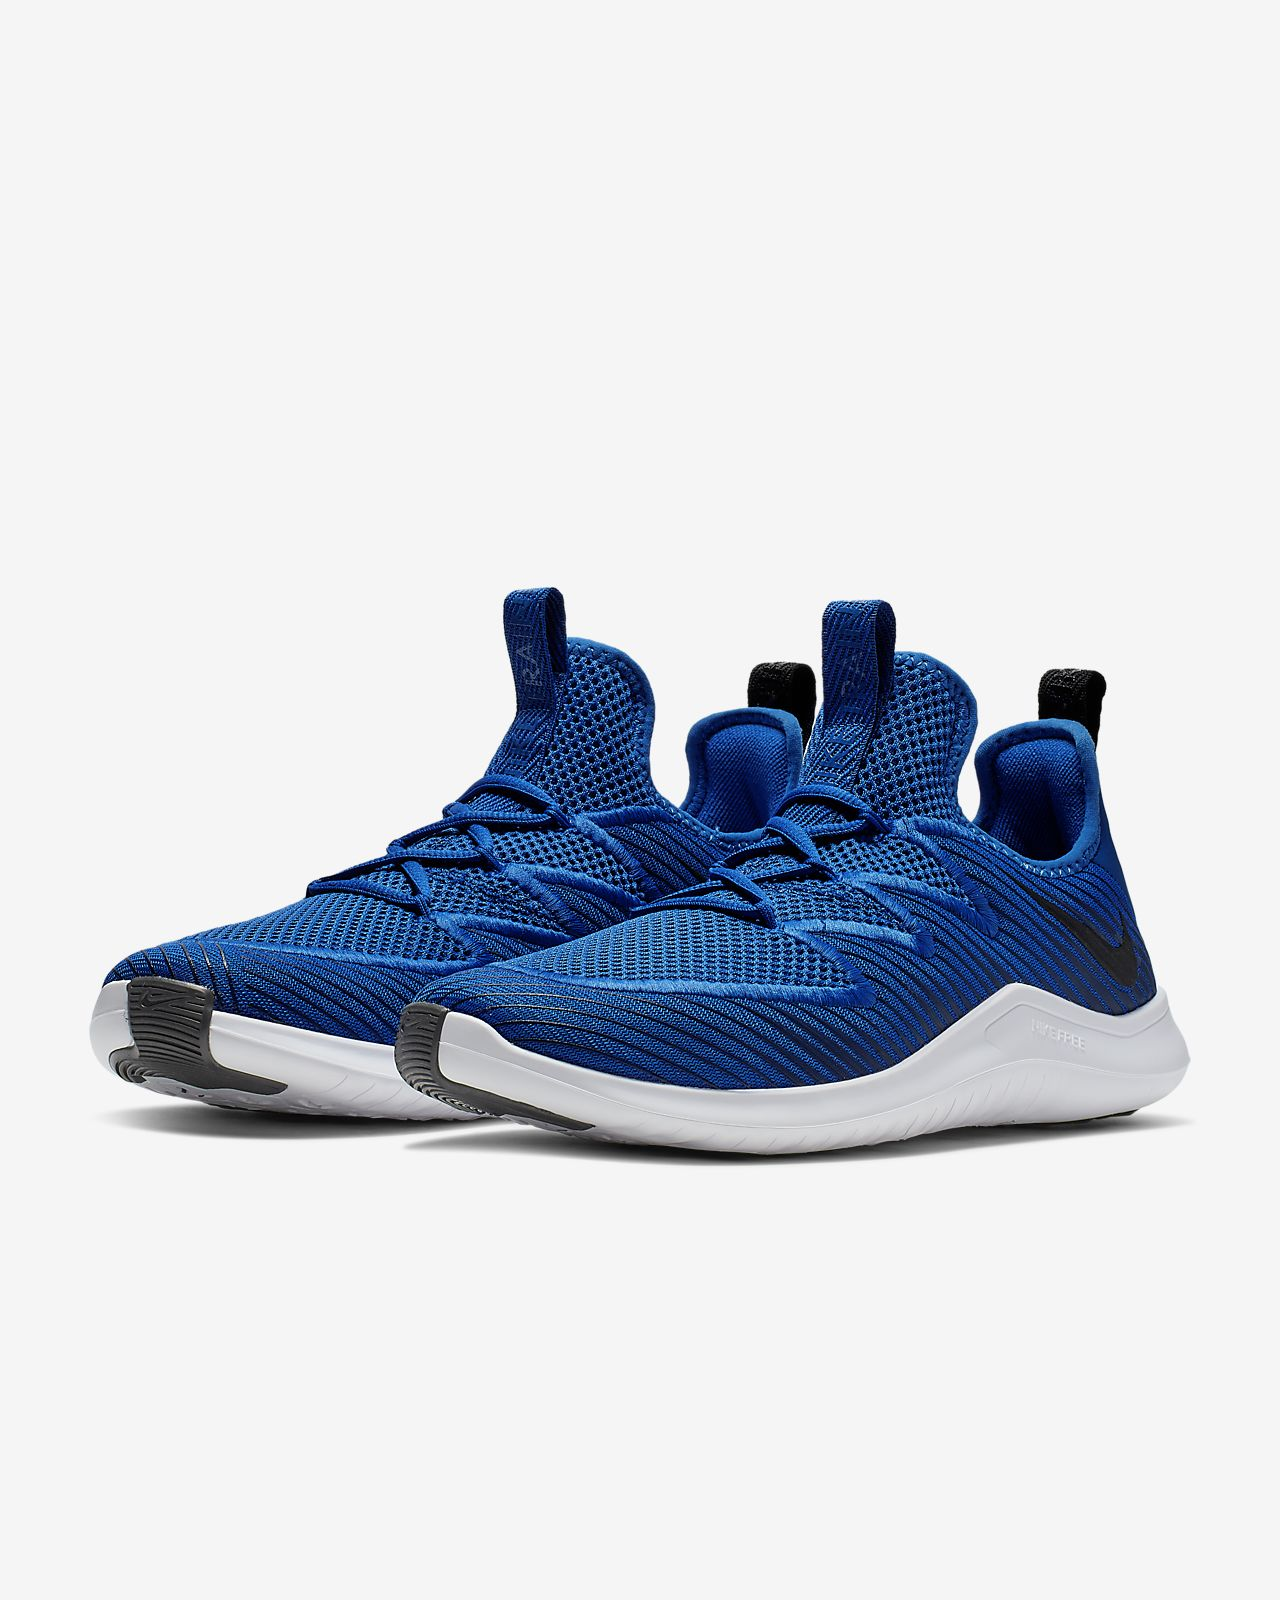 32c75540f1c5 Nike Free TR 9 Ultra Men s Training Shoe. Nike.com AU